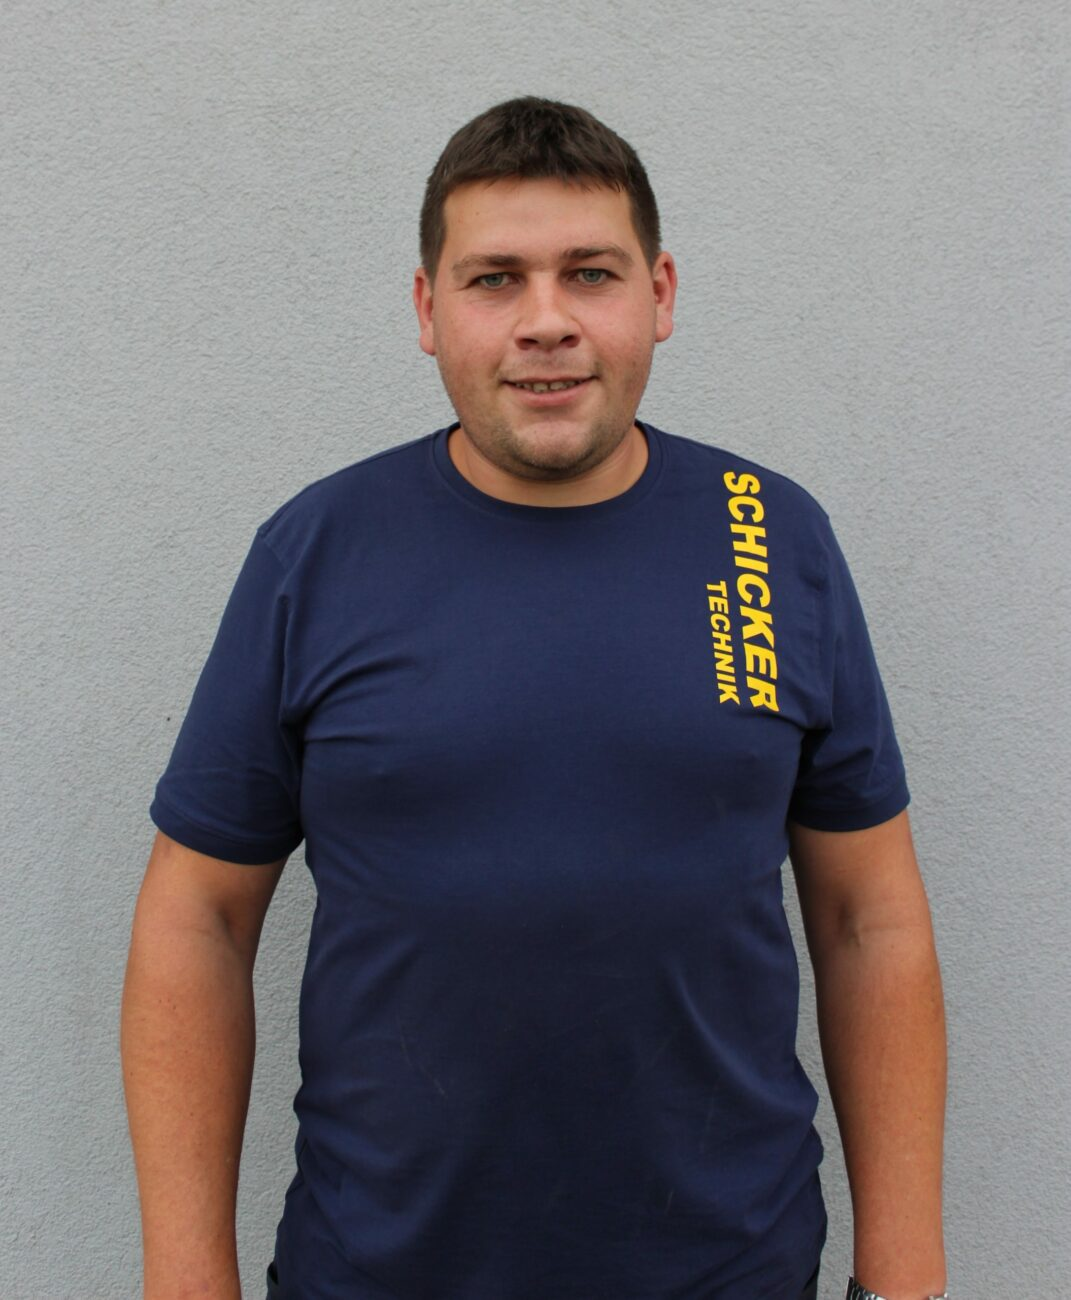 Mario Sokol